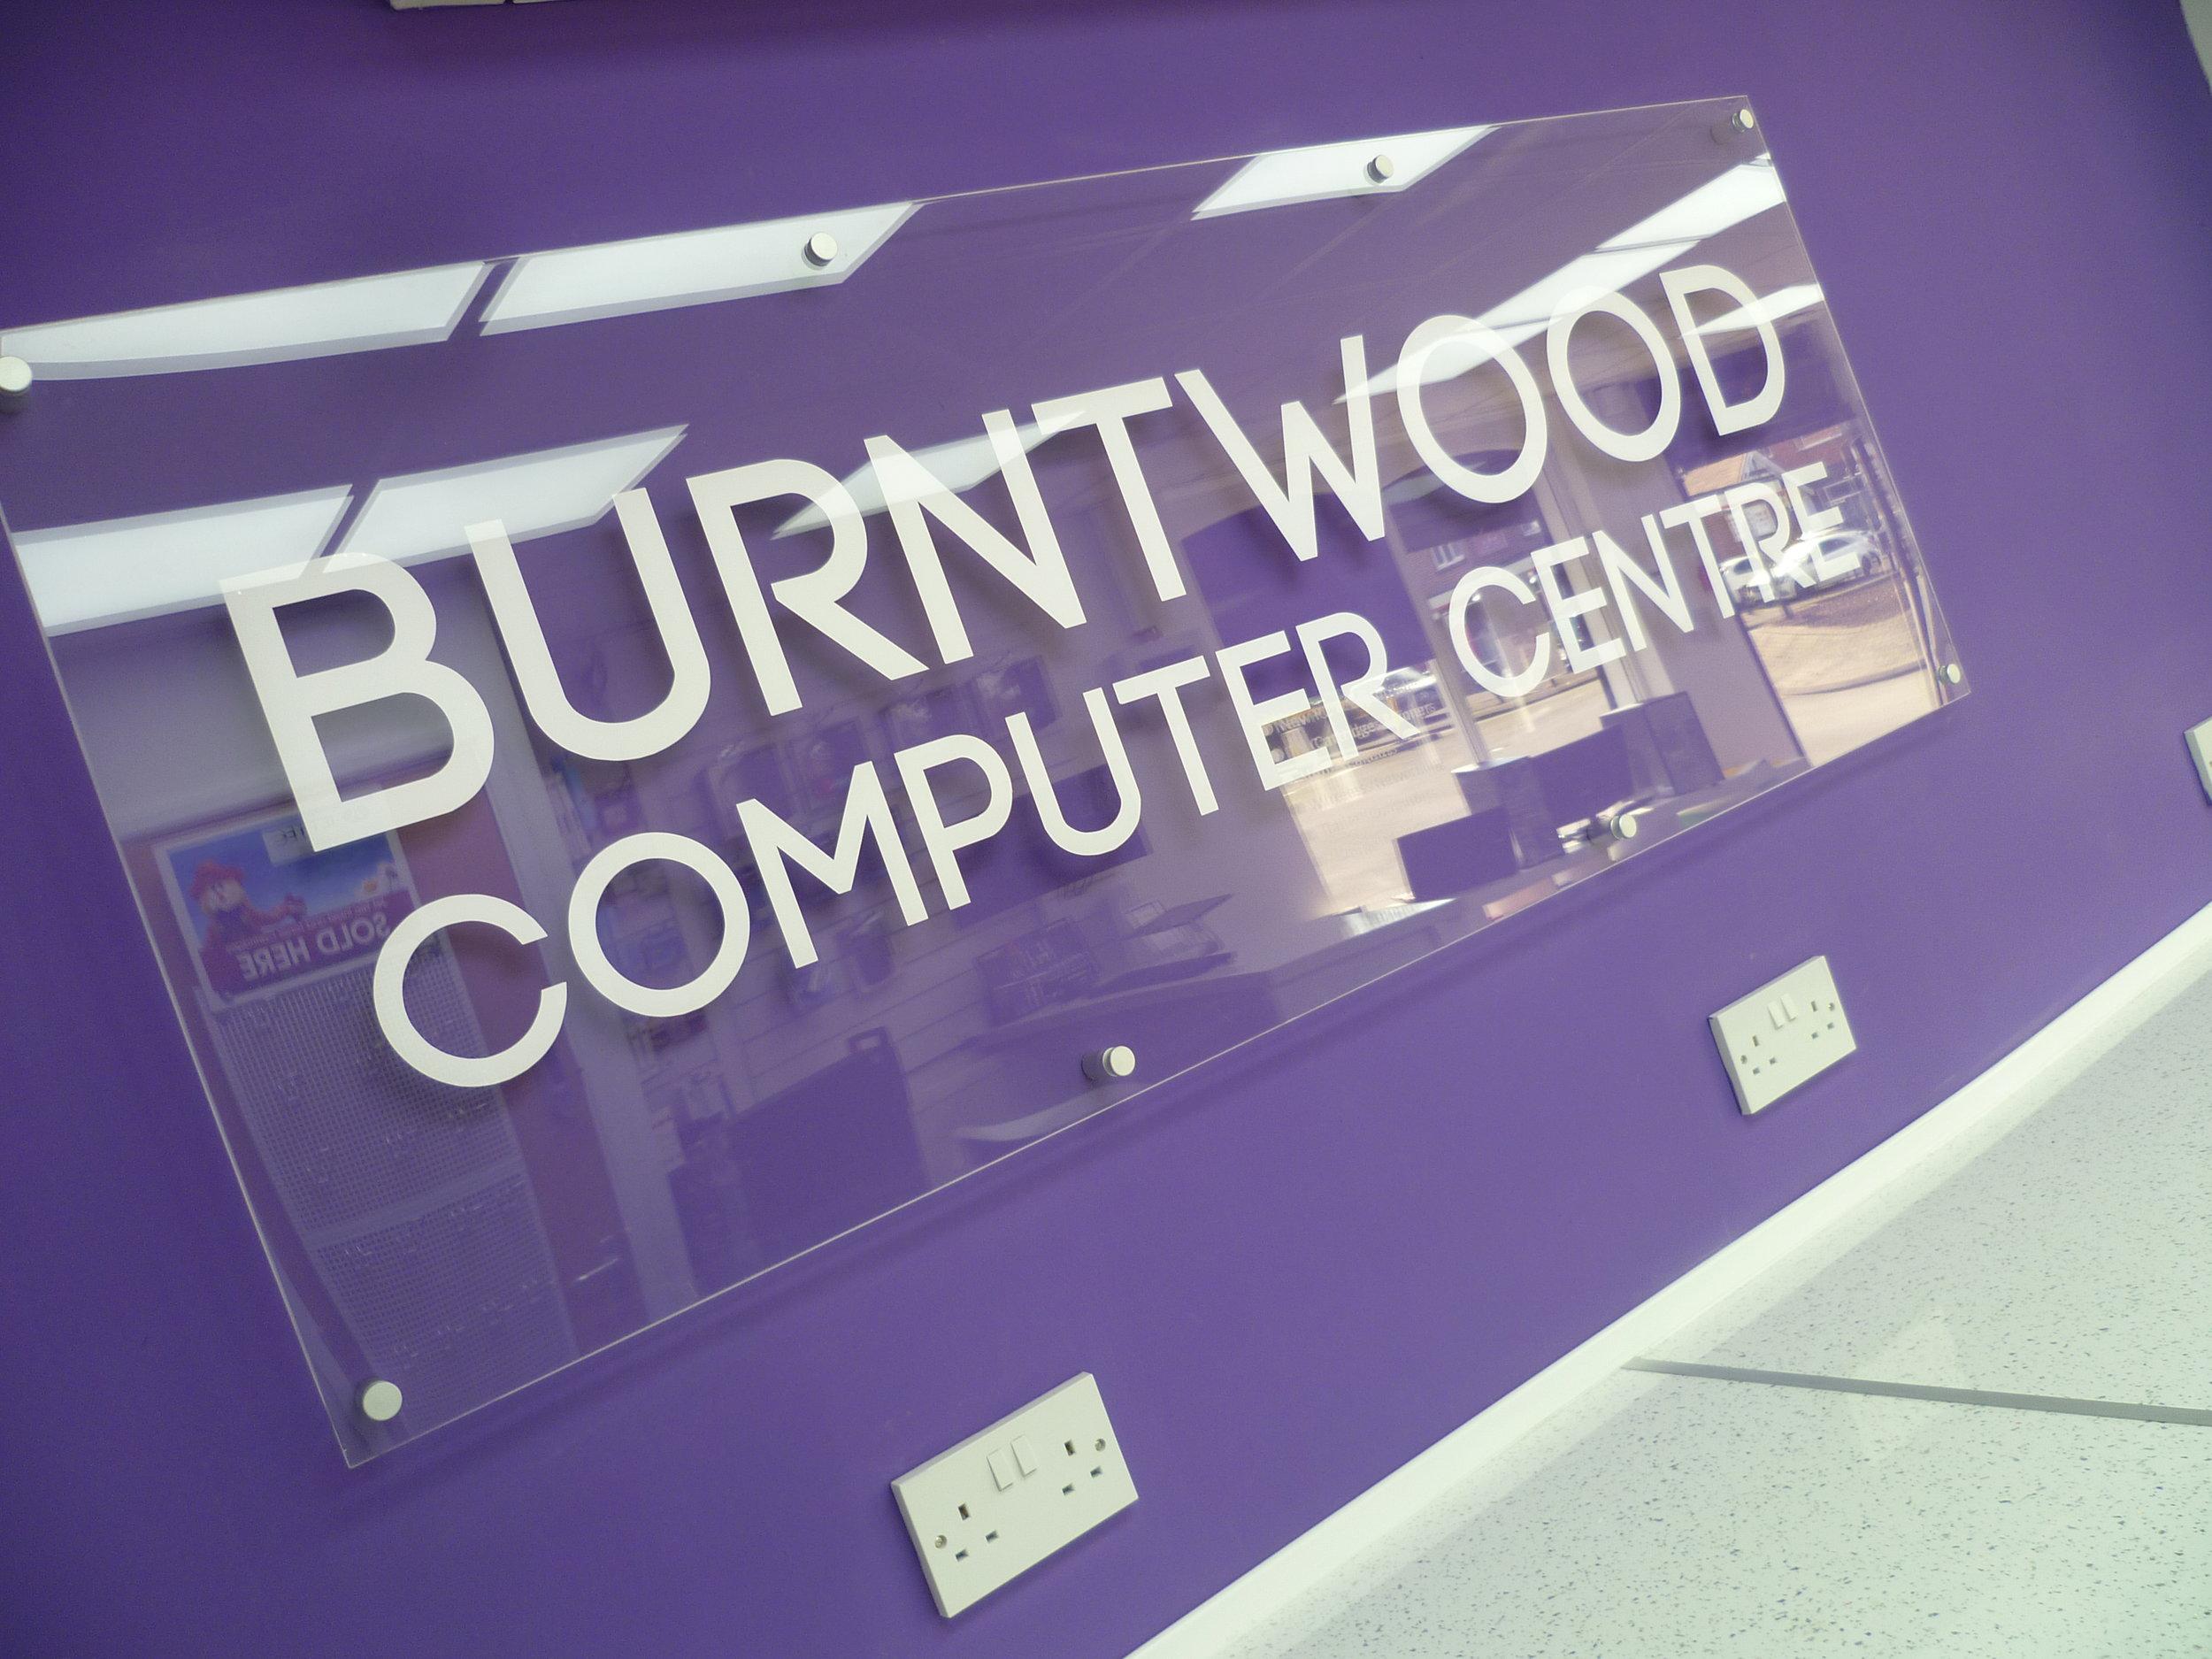 Staffordshire Computer Repairs